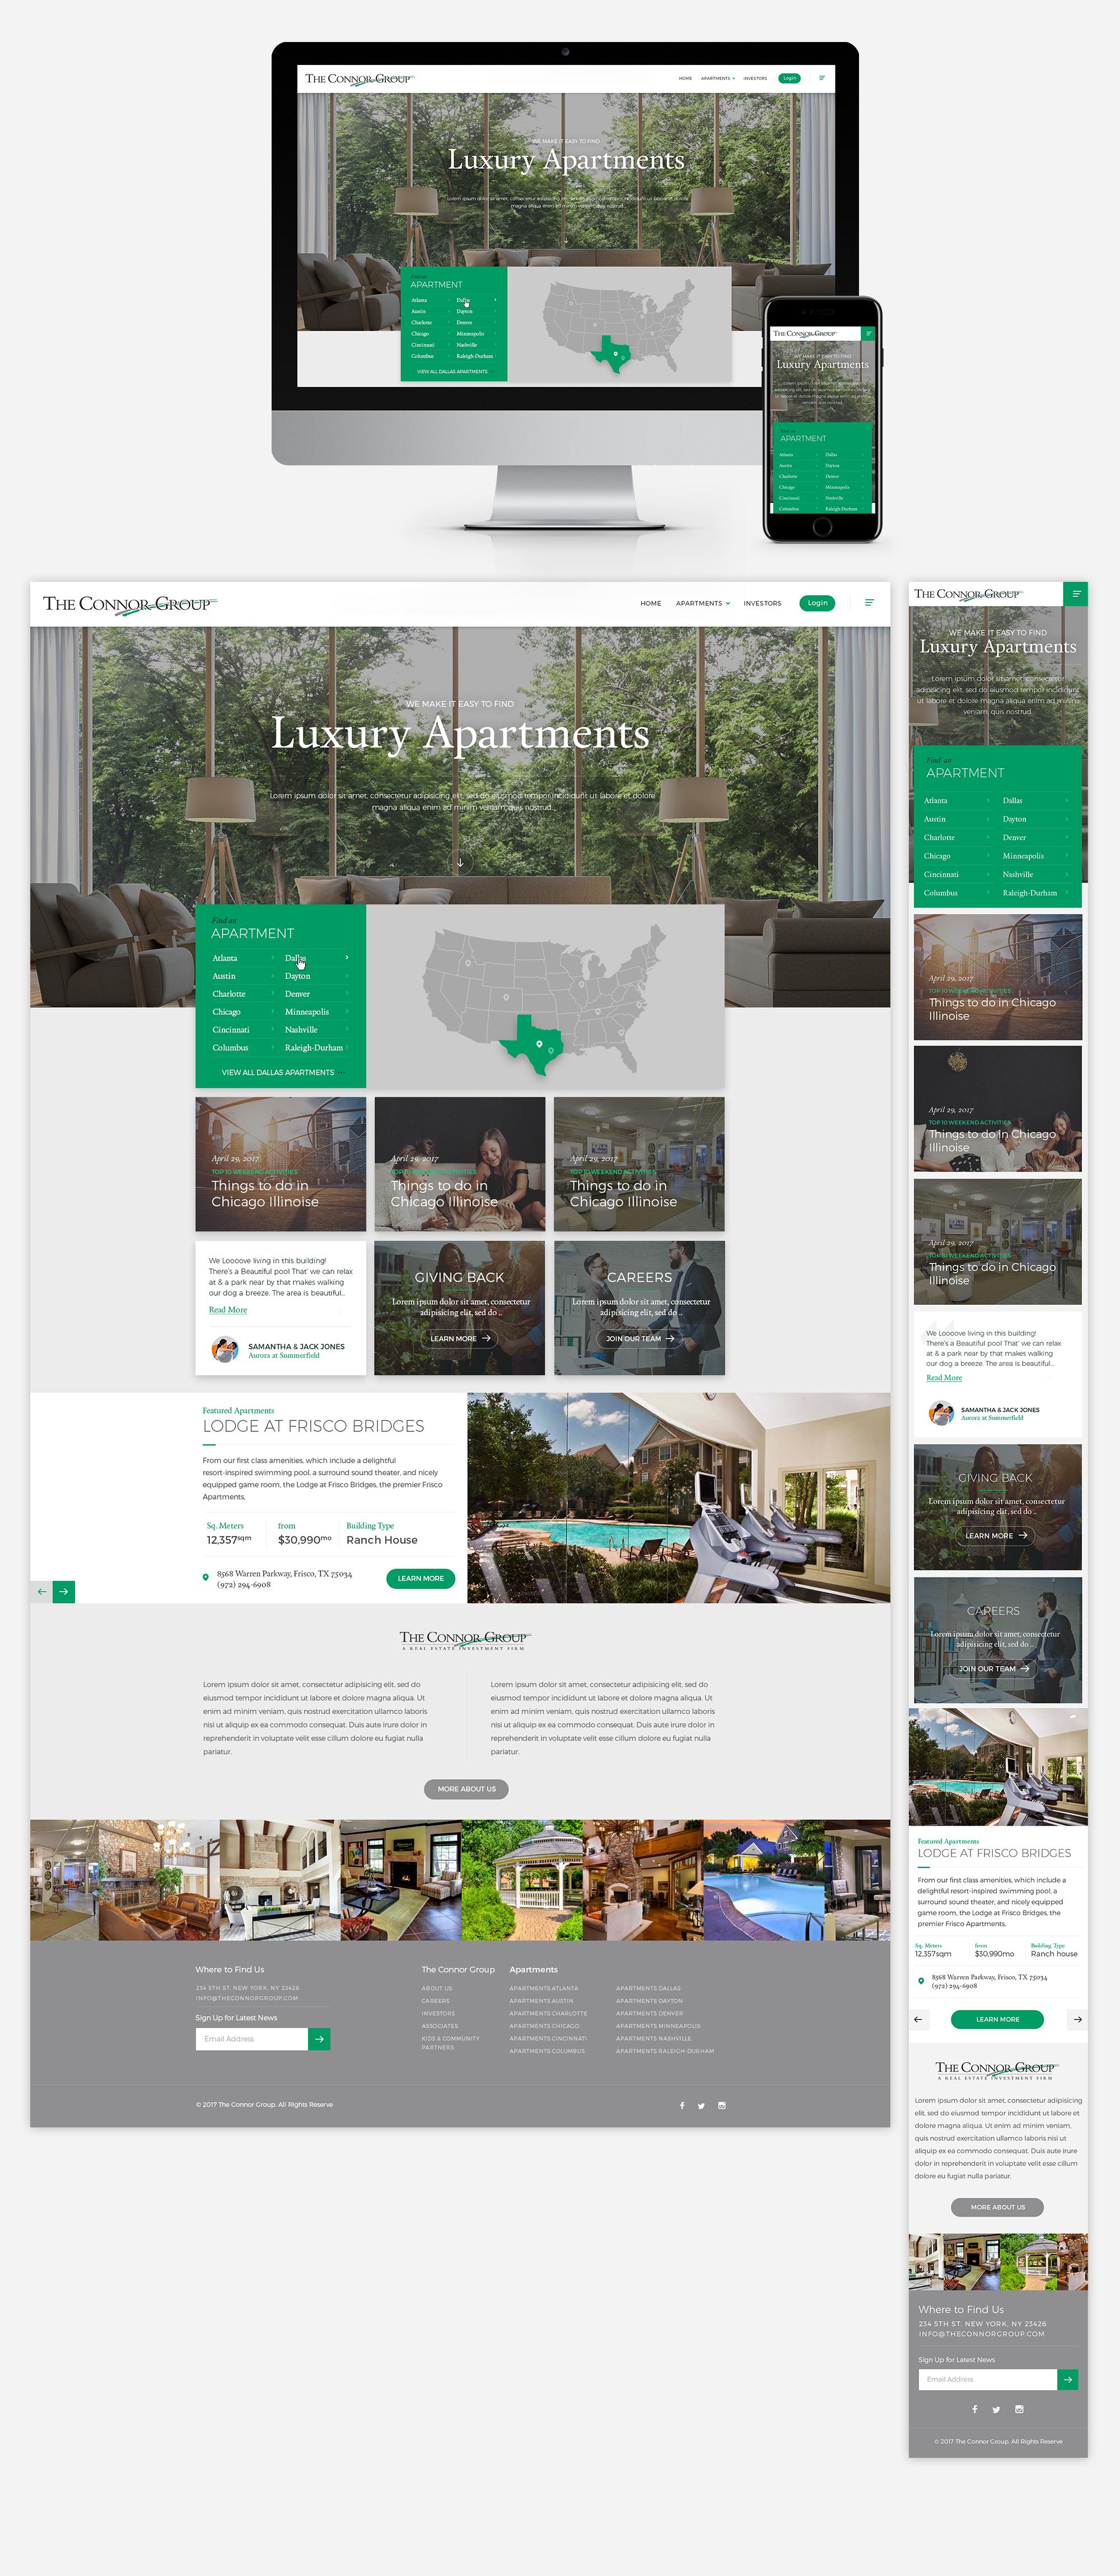 Pin By Skyler O On Dsgn 360 Proj 1 Moodboard Website Design Inspiration Webpage Layout Layout Design